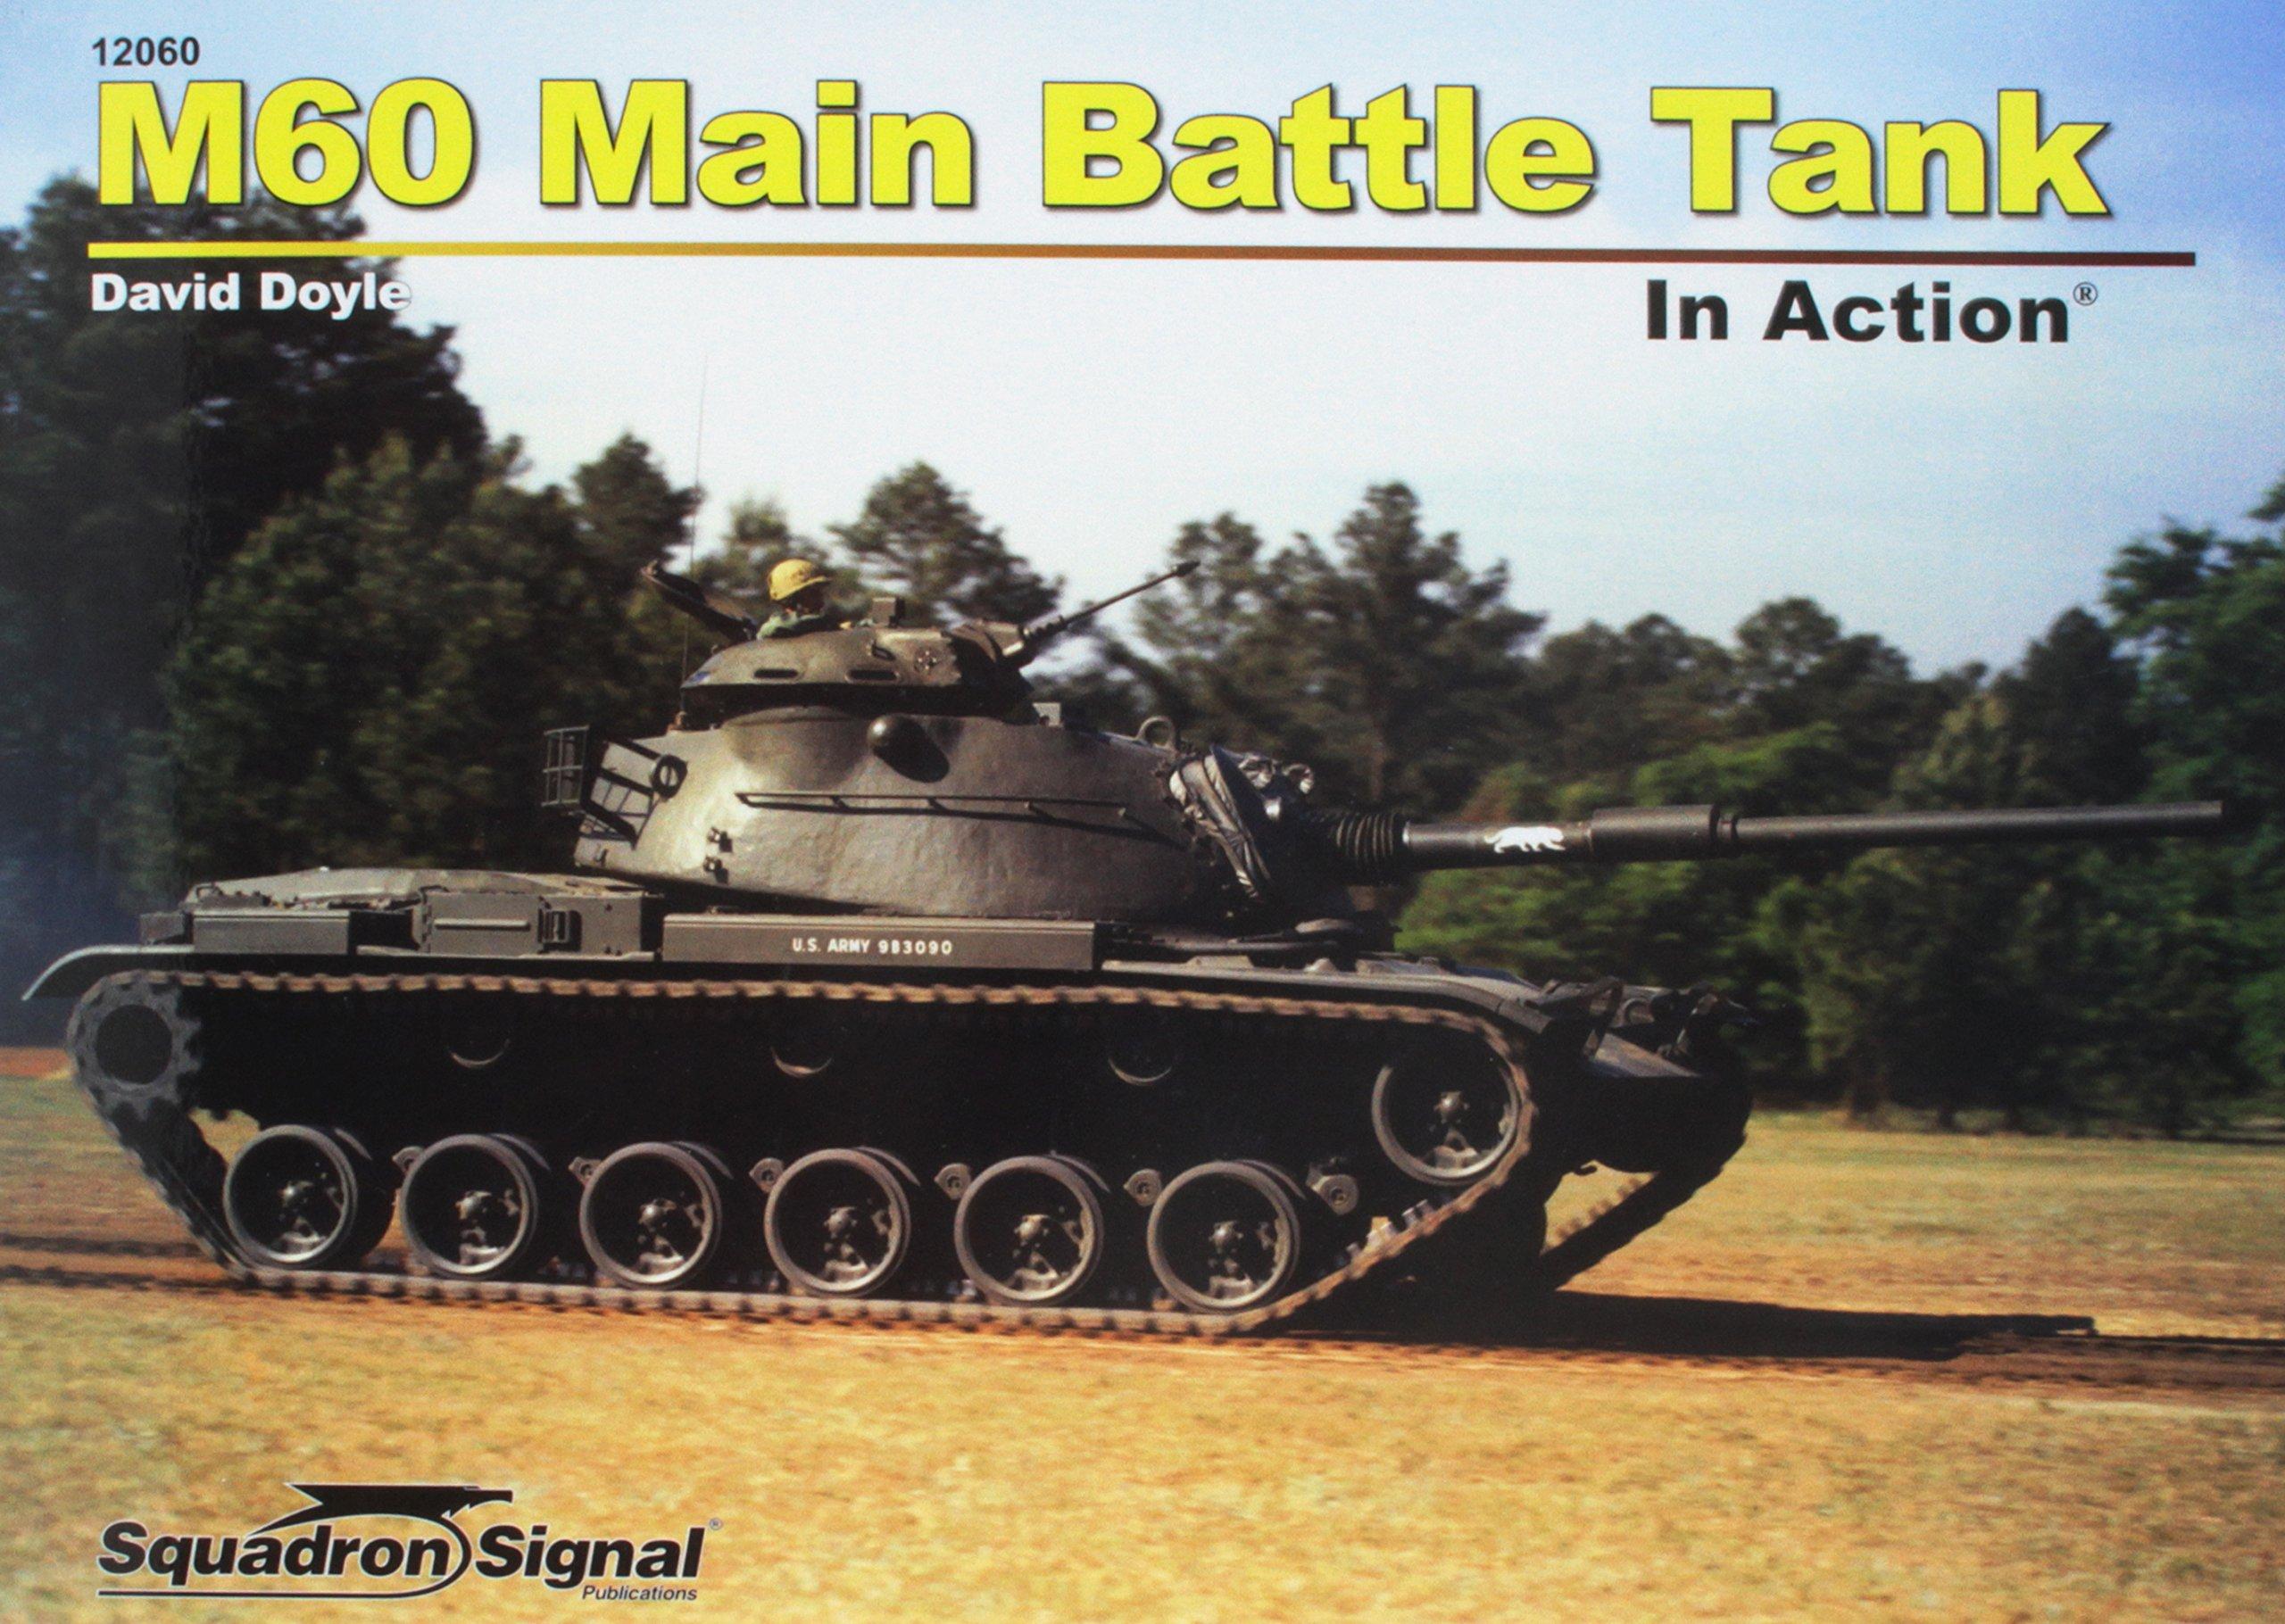 m60 main battle tank in action david doyle 9780897478458 amazon